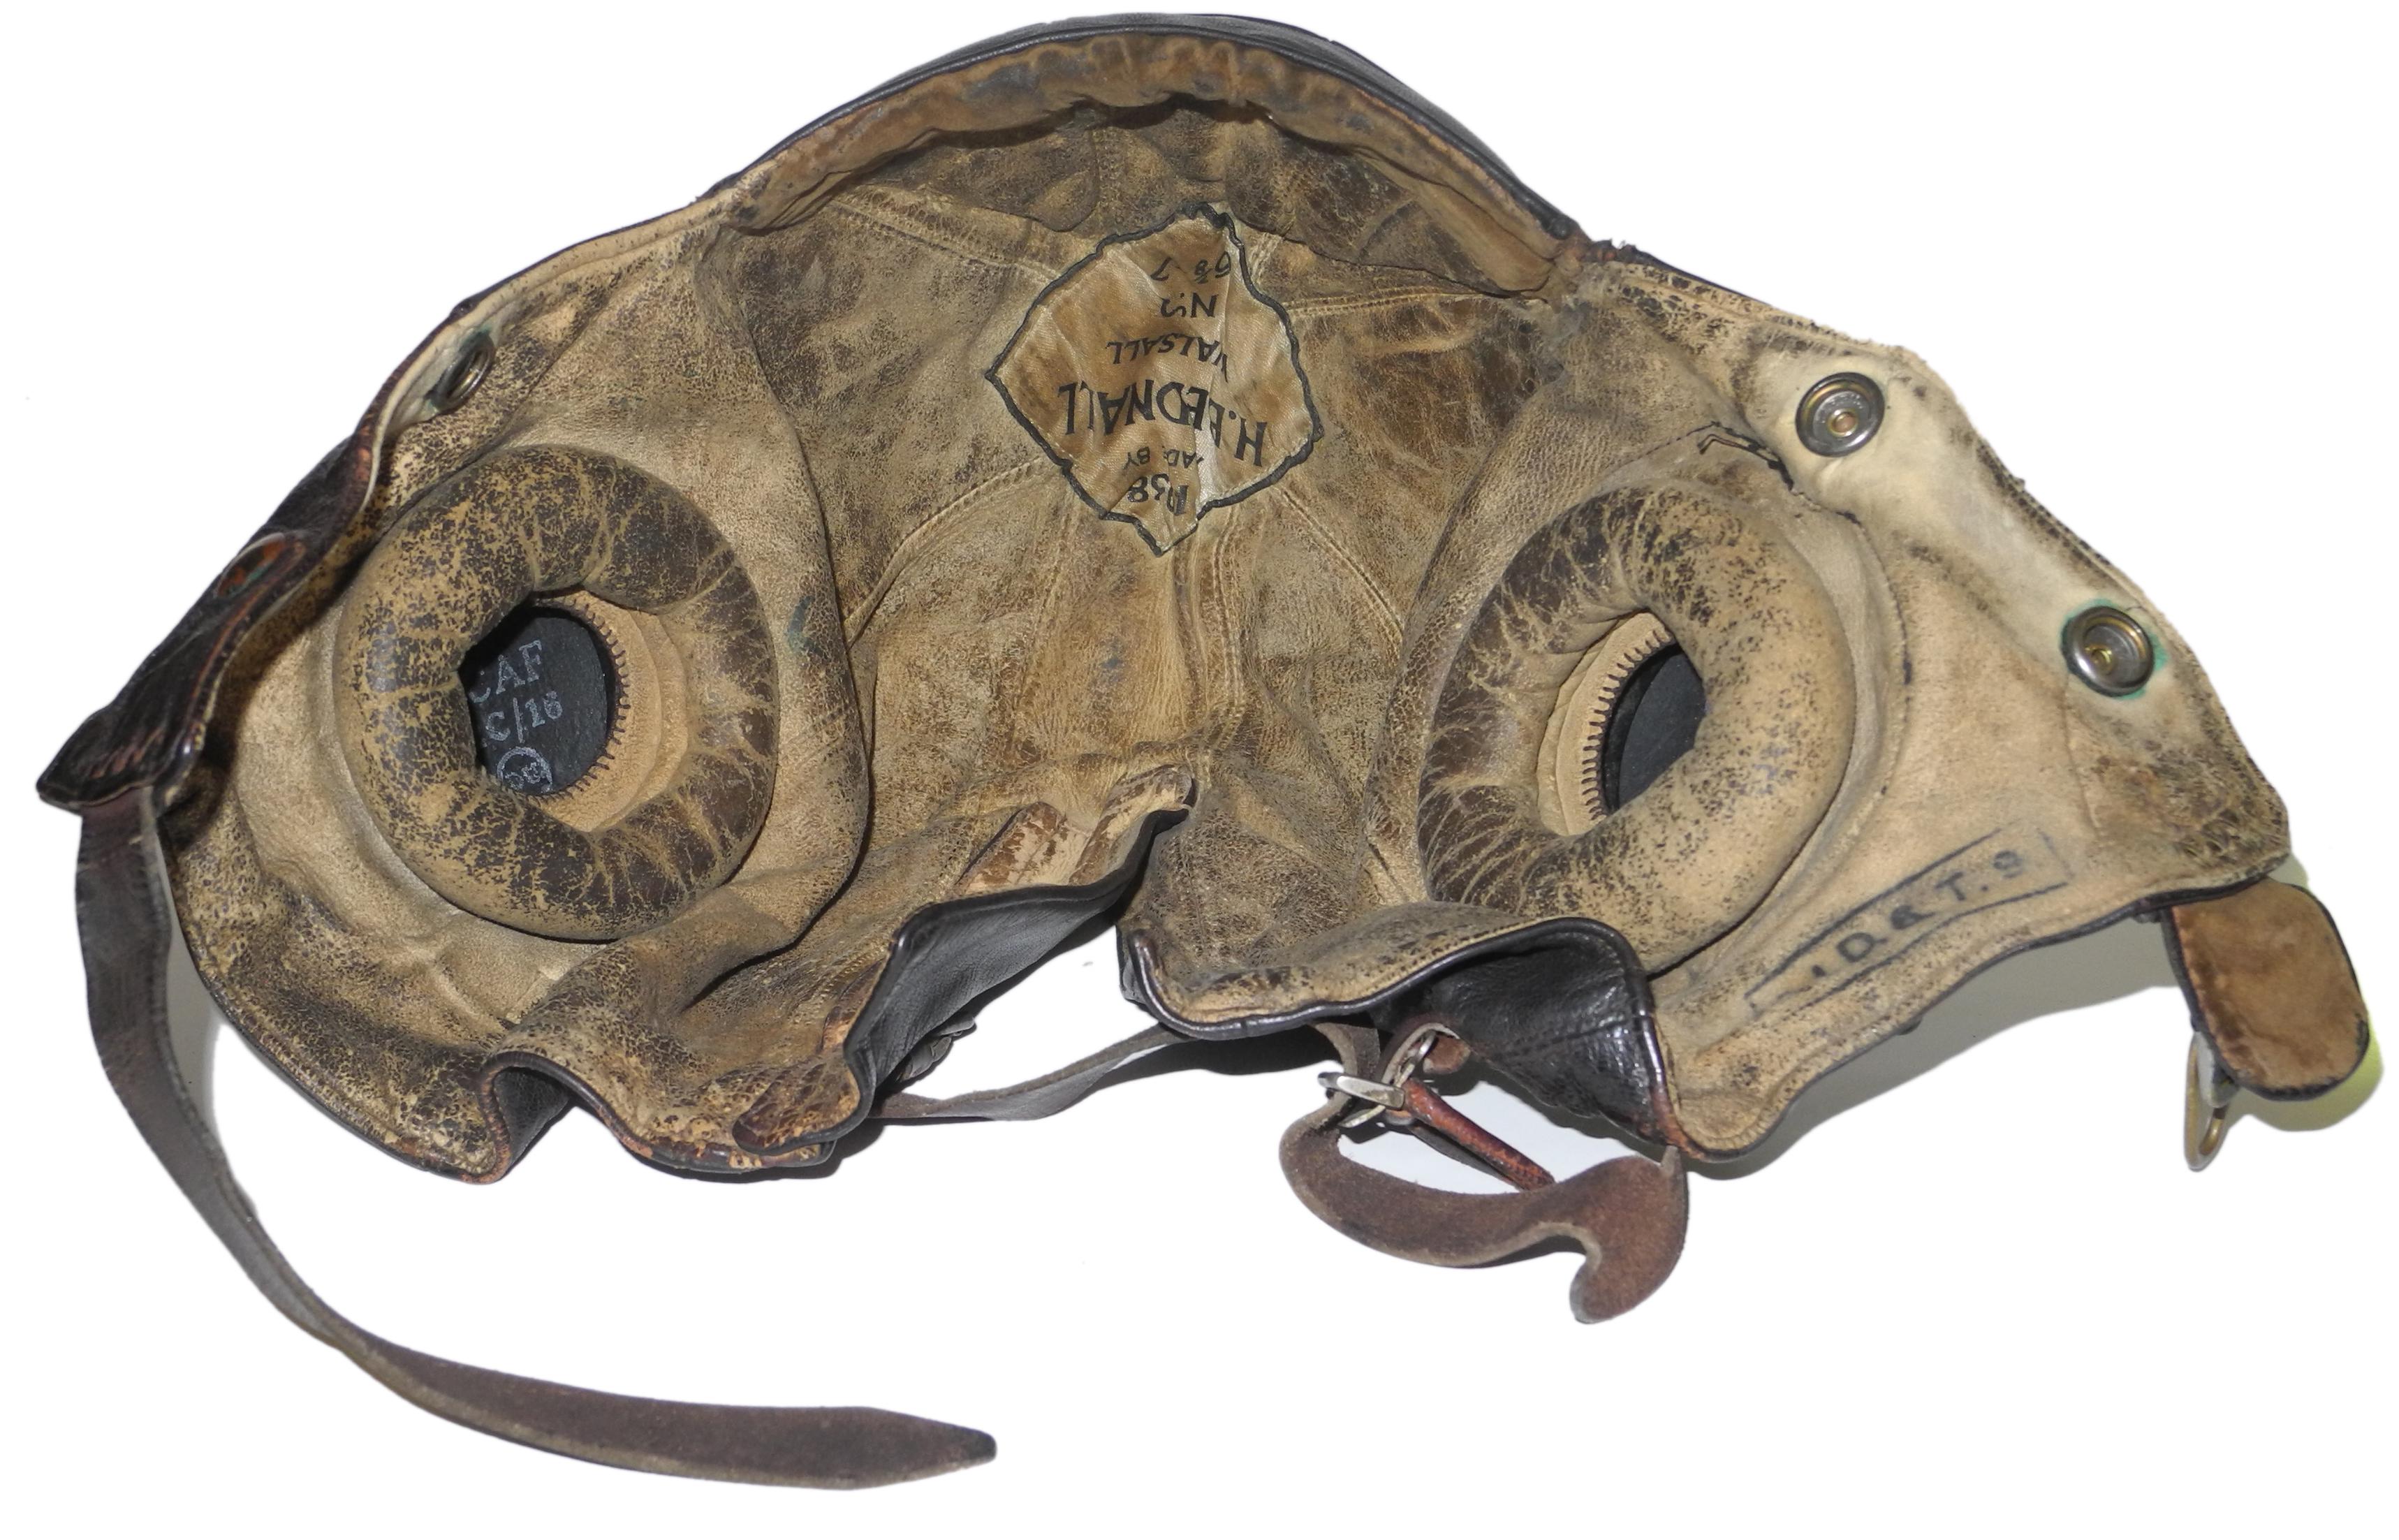 RAF Type B helmet by Bednalls 1938